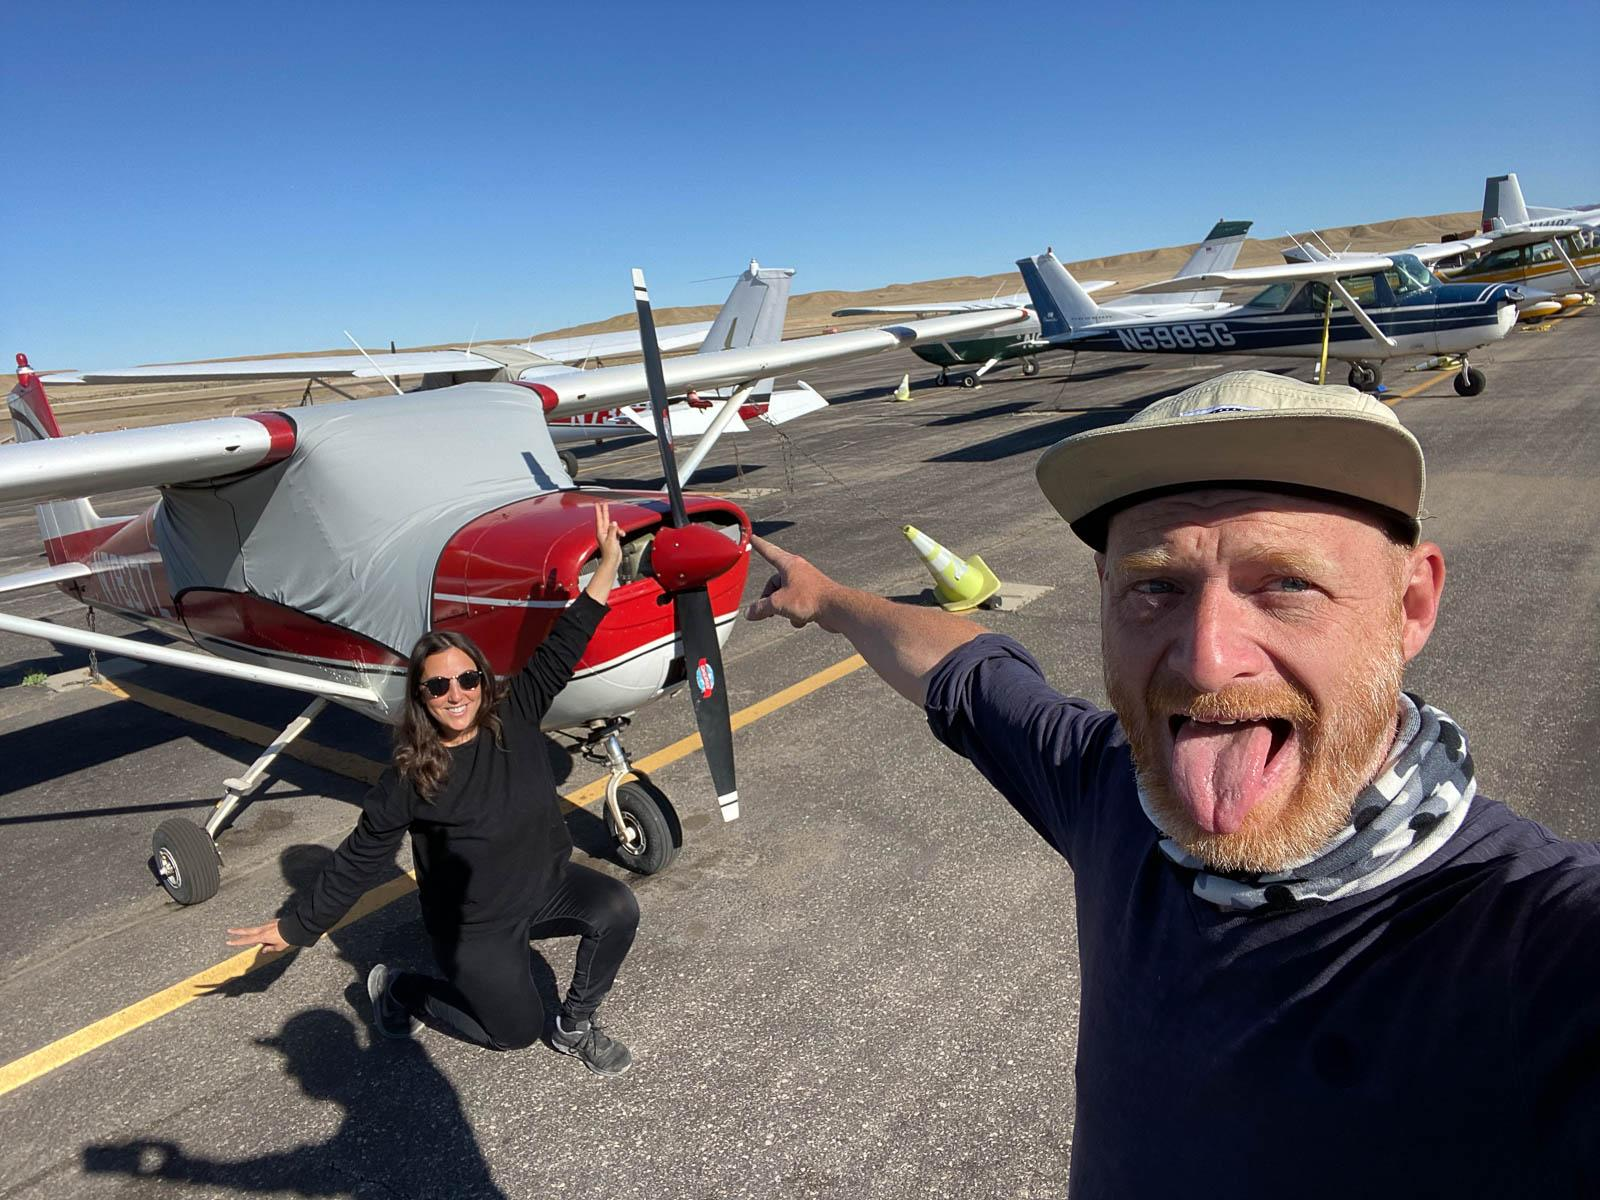 Friends aiplane!